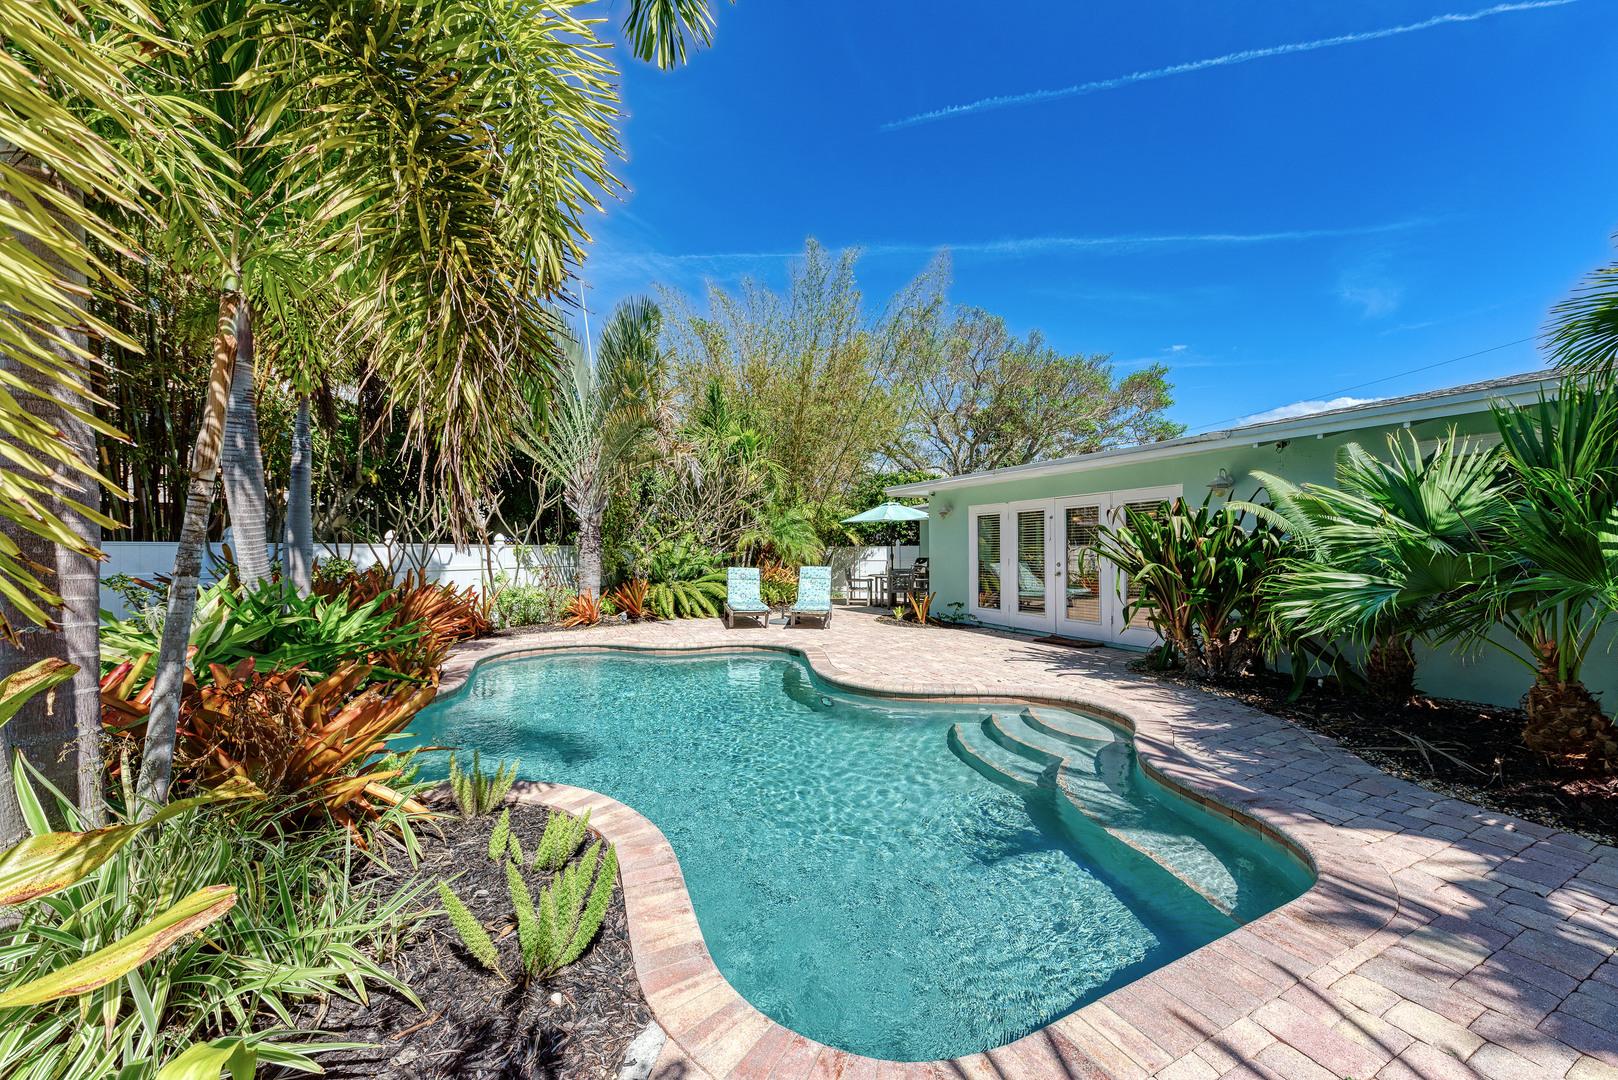 Mermaids & Manatees backyard view of pool